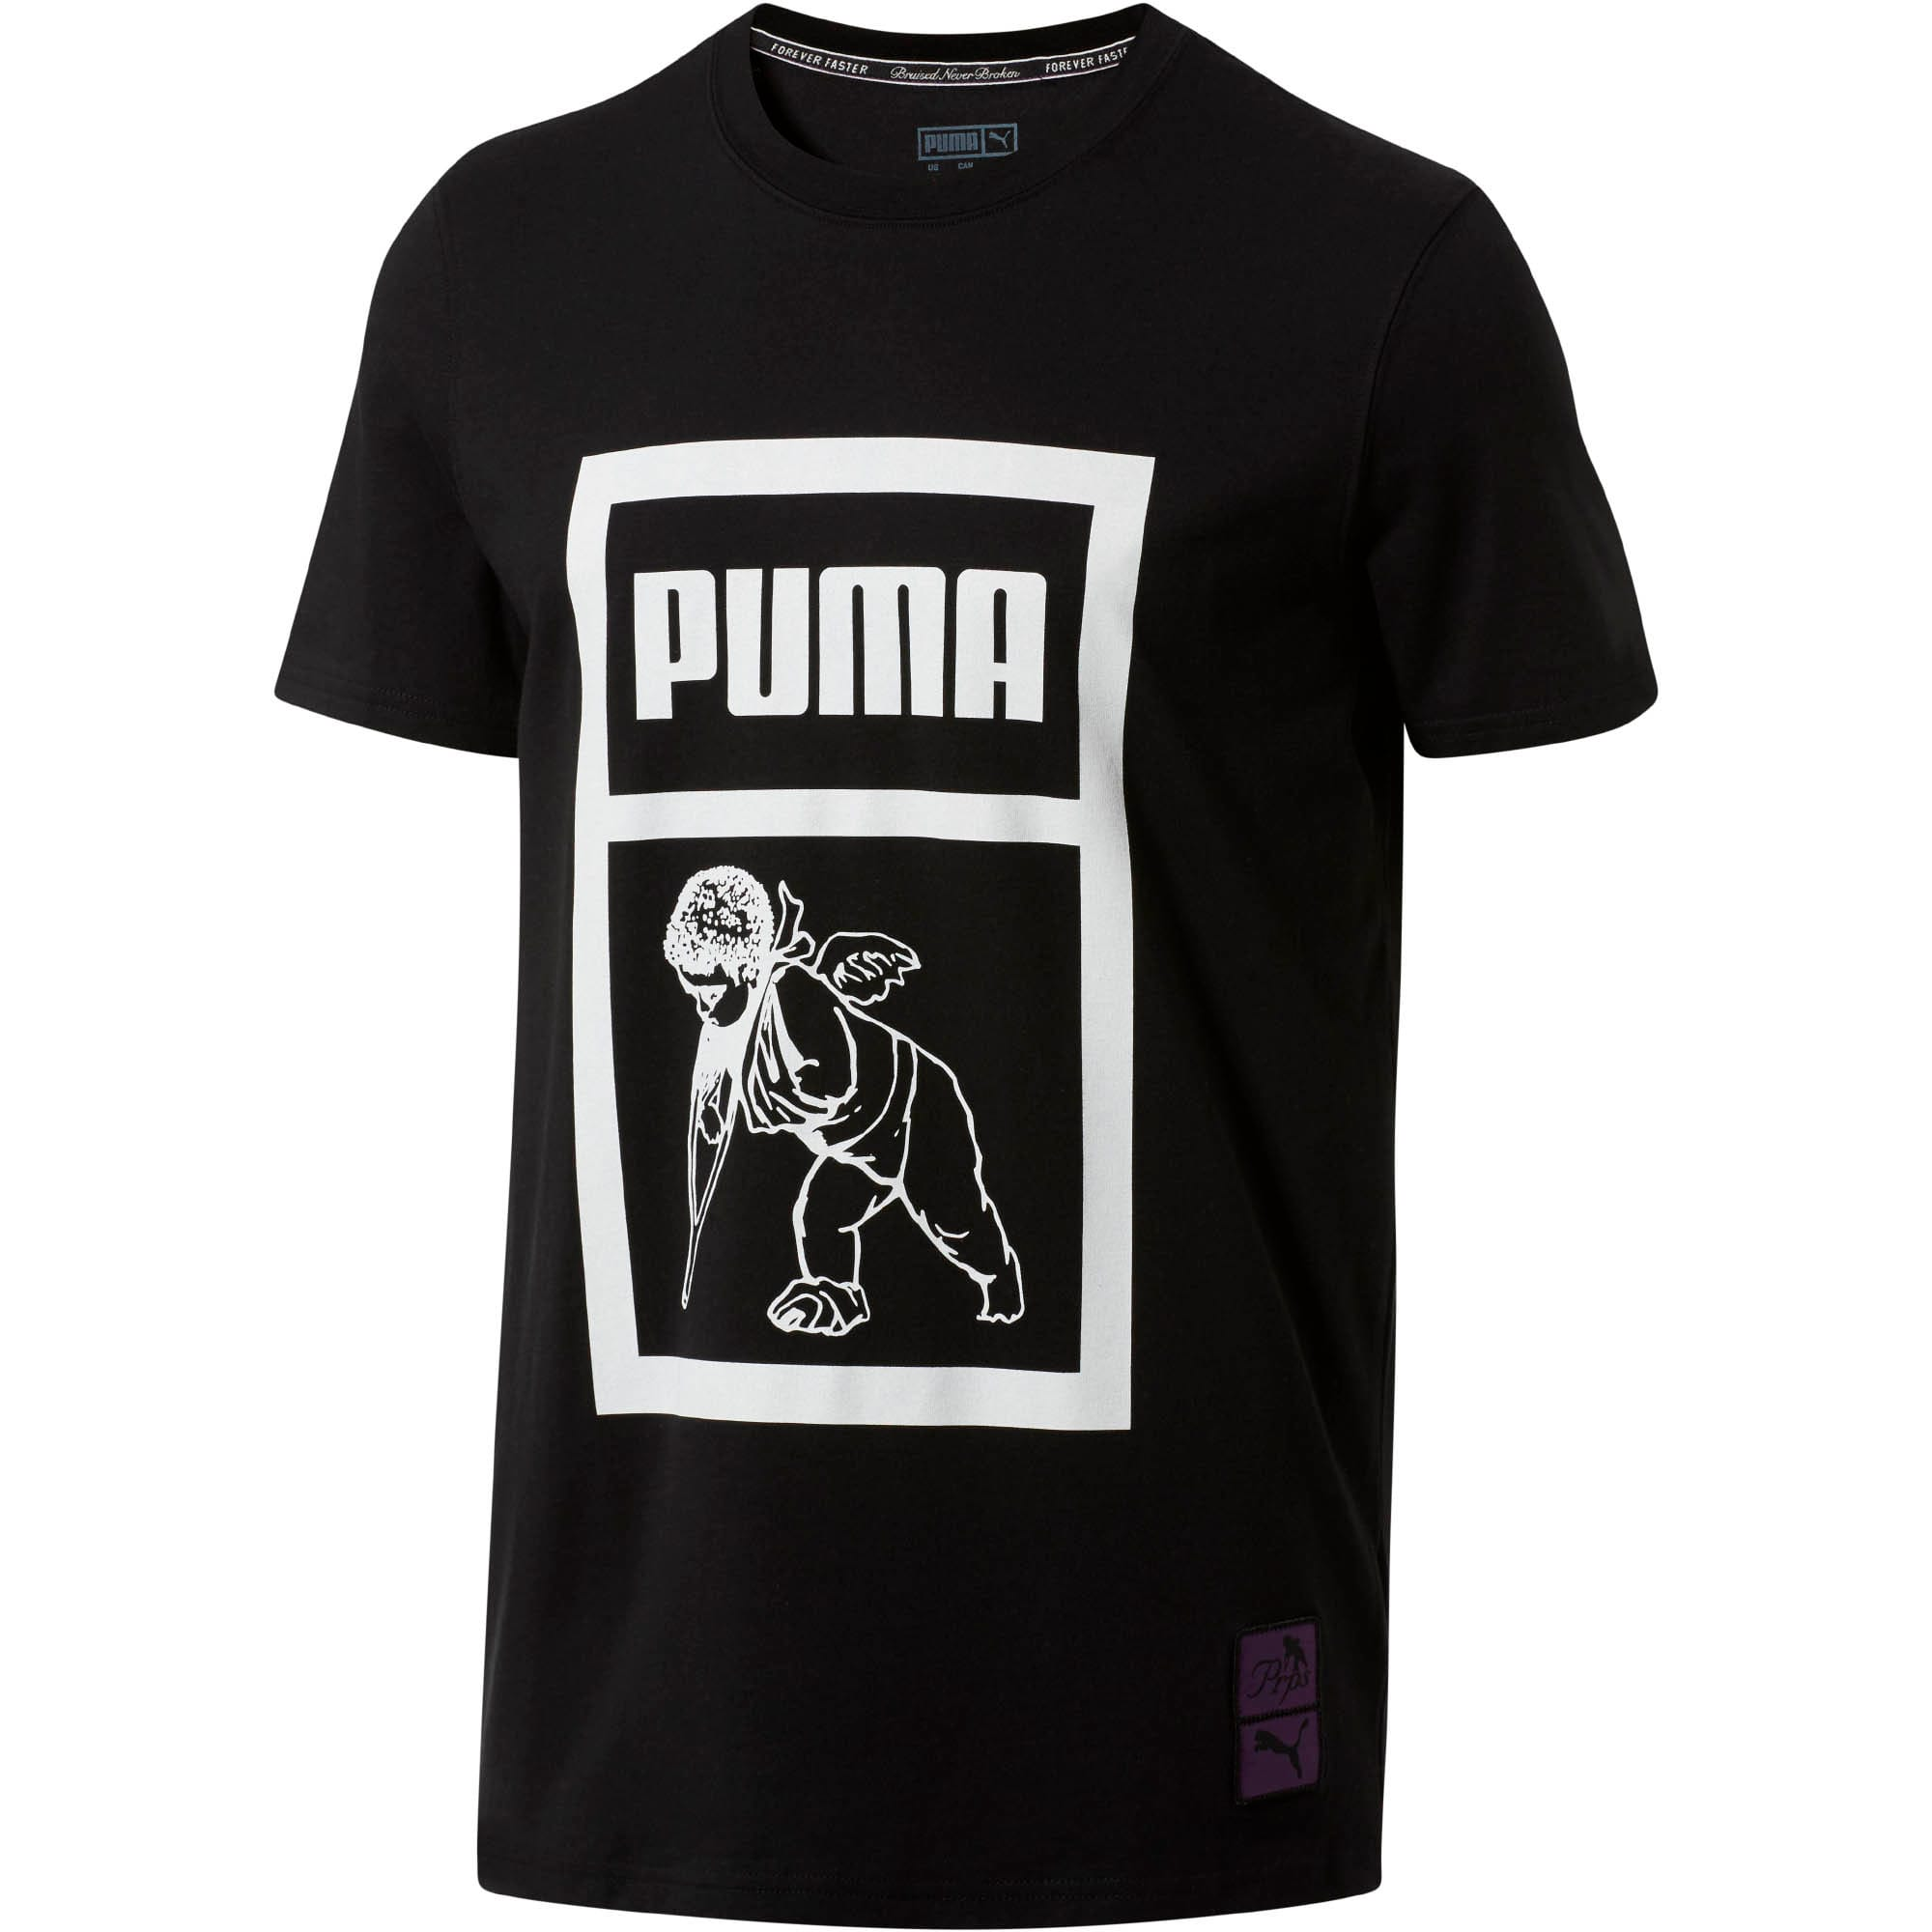 Thumbnail 1 of PUMA x PRPS SS Tee, Puma Black, medium